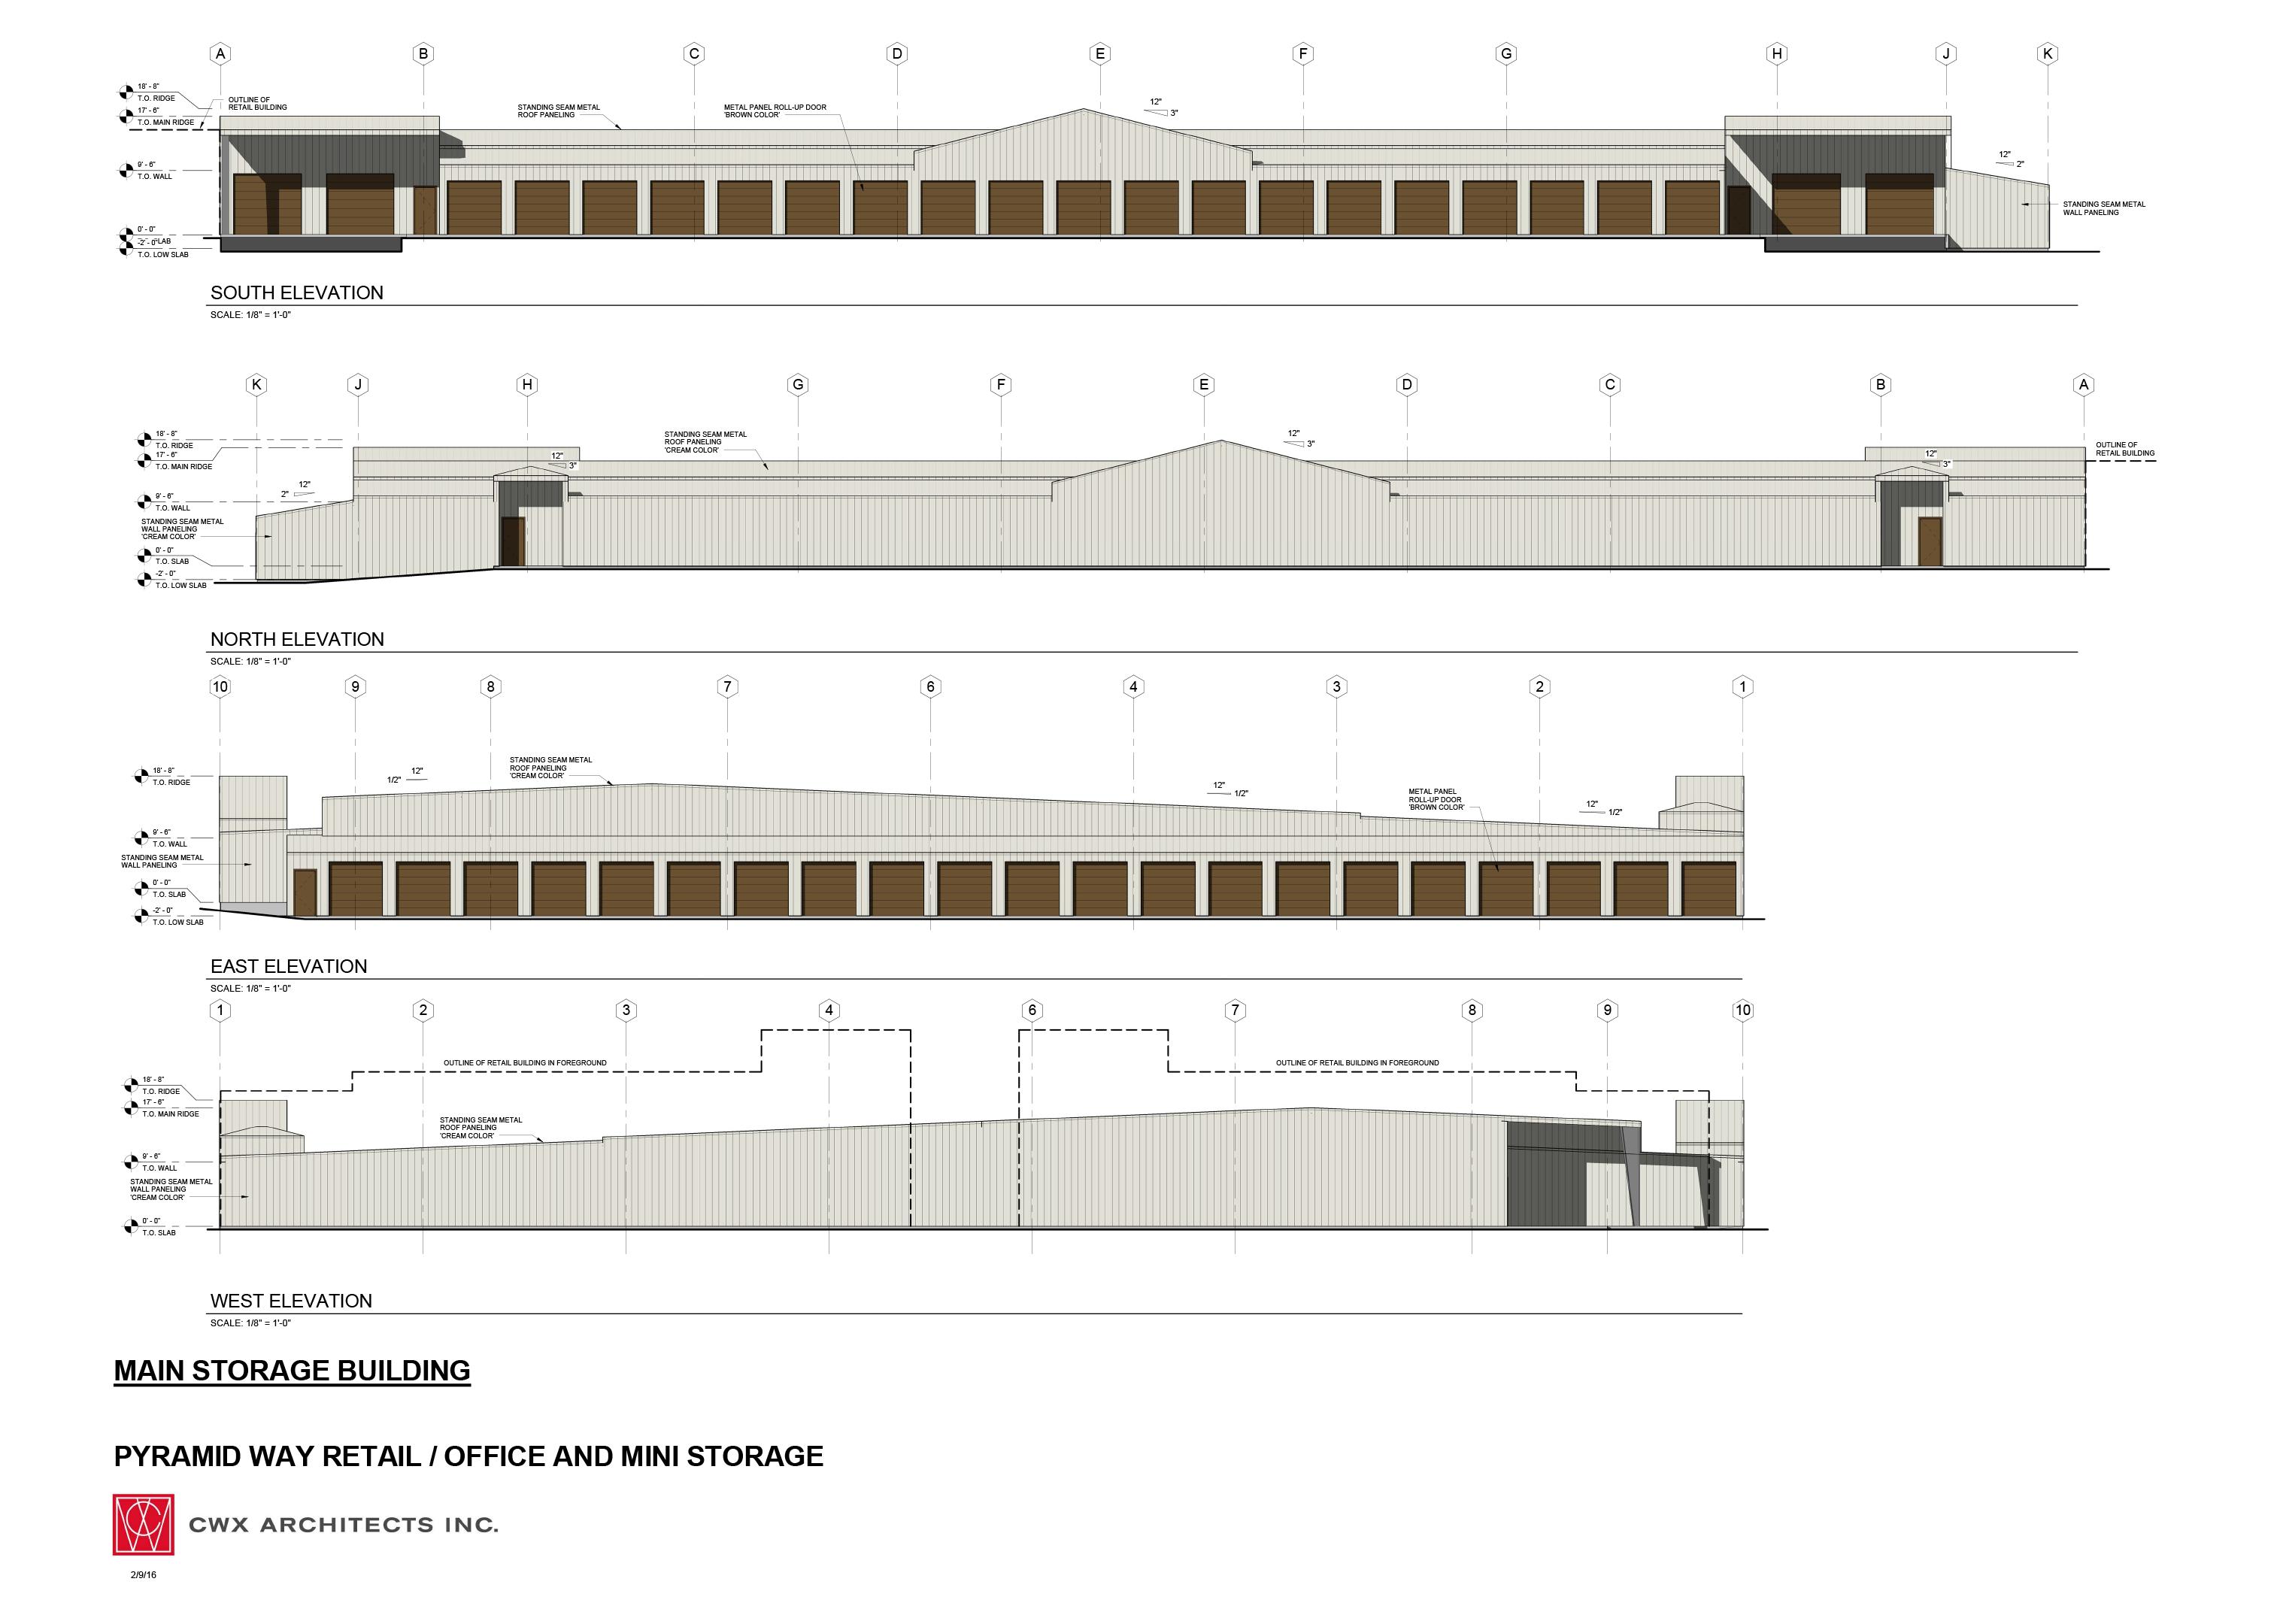 Pyramid-Way-Complex—Main-Storage-Bldg—Elevations-2-12-16